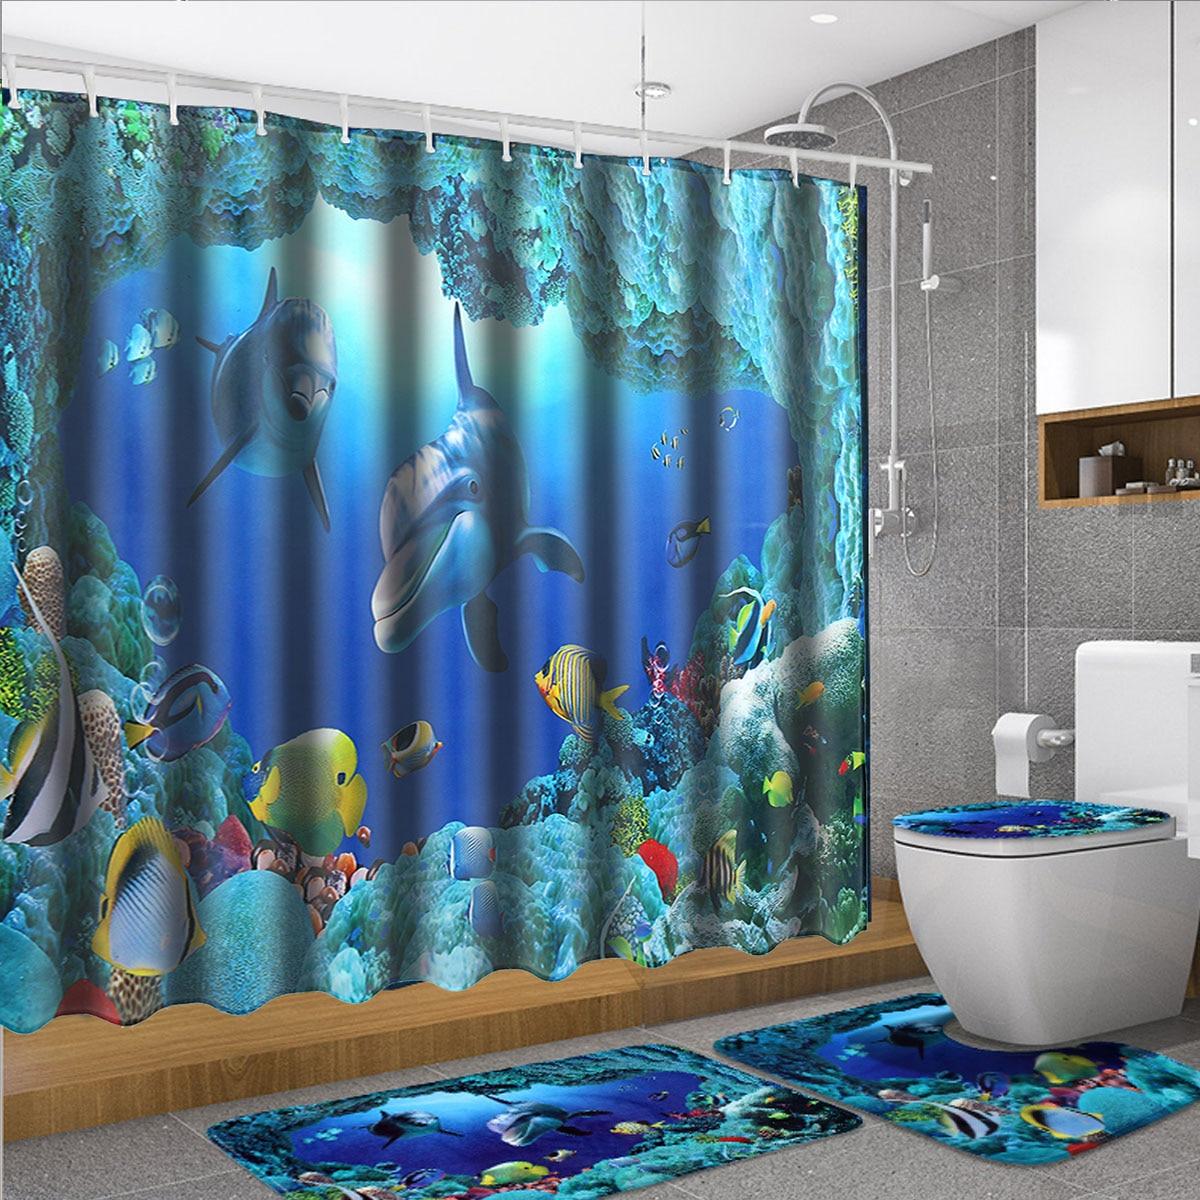 Bath 3d Dark Green Tree 8 Shower Curtain Waterproof Fiber Bathroom Windows Toilet